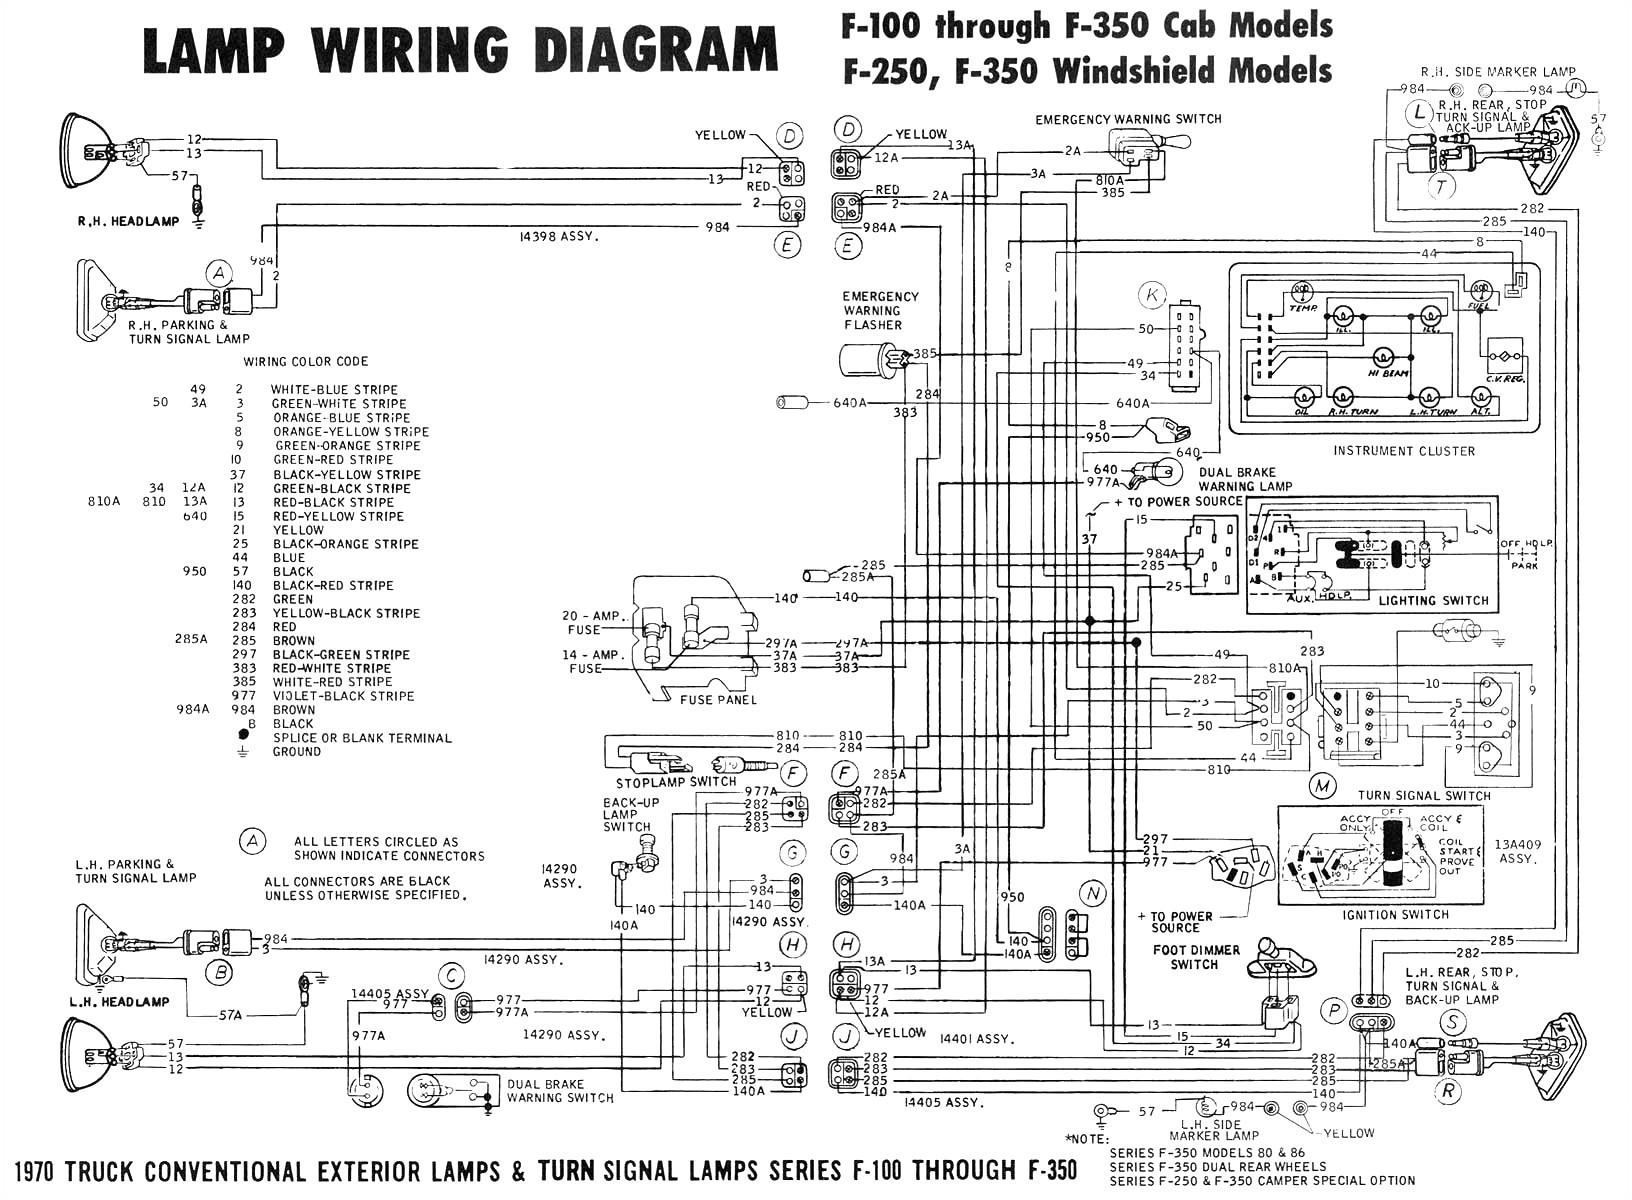 1998 ford f150 automatic transmission diagram